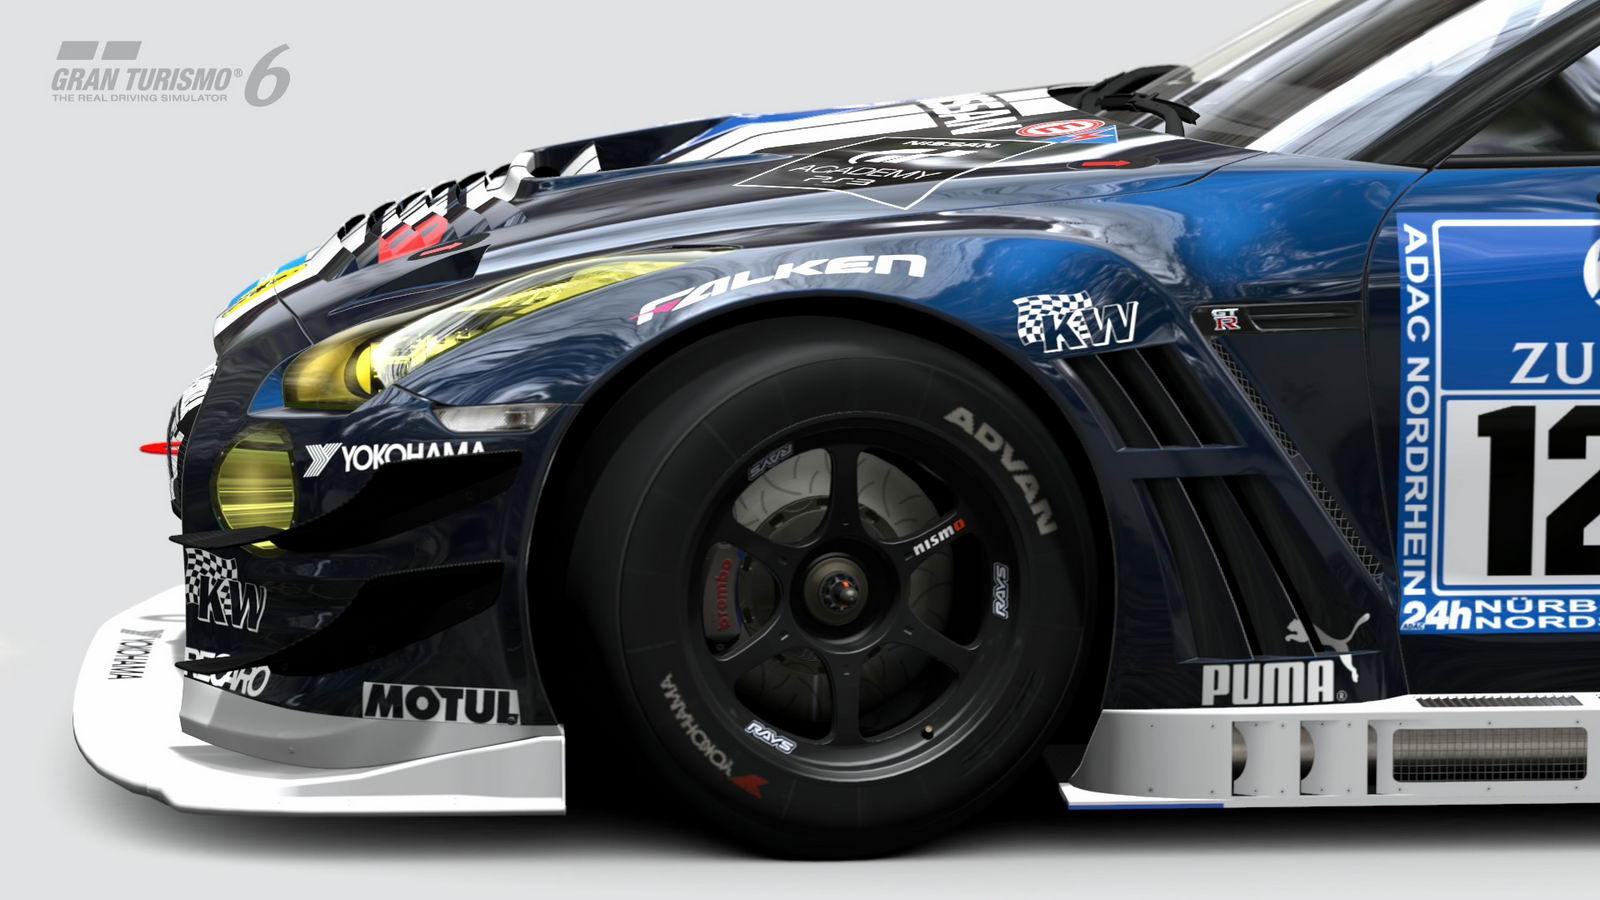 Арт Gran Turismo 6